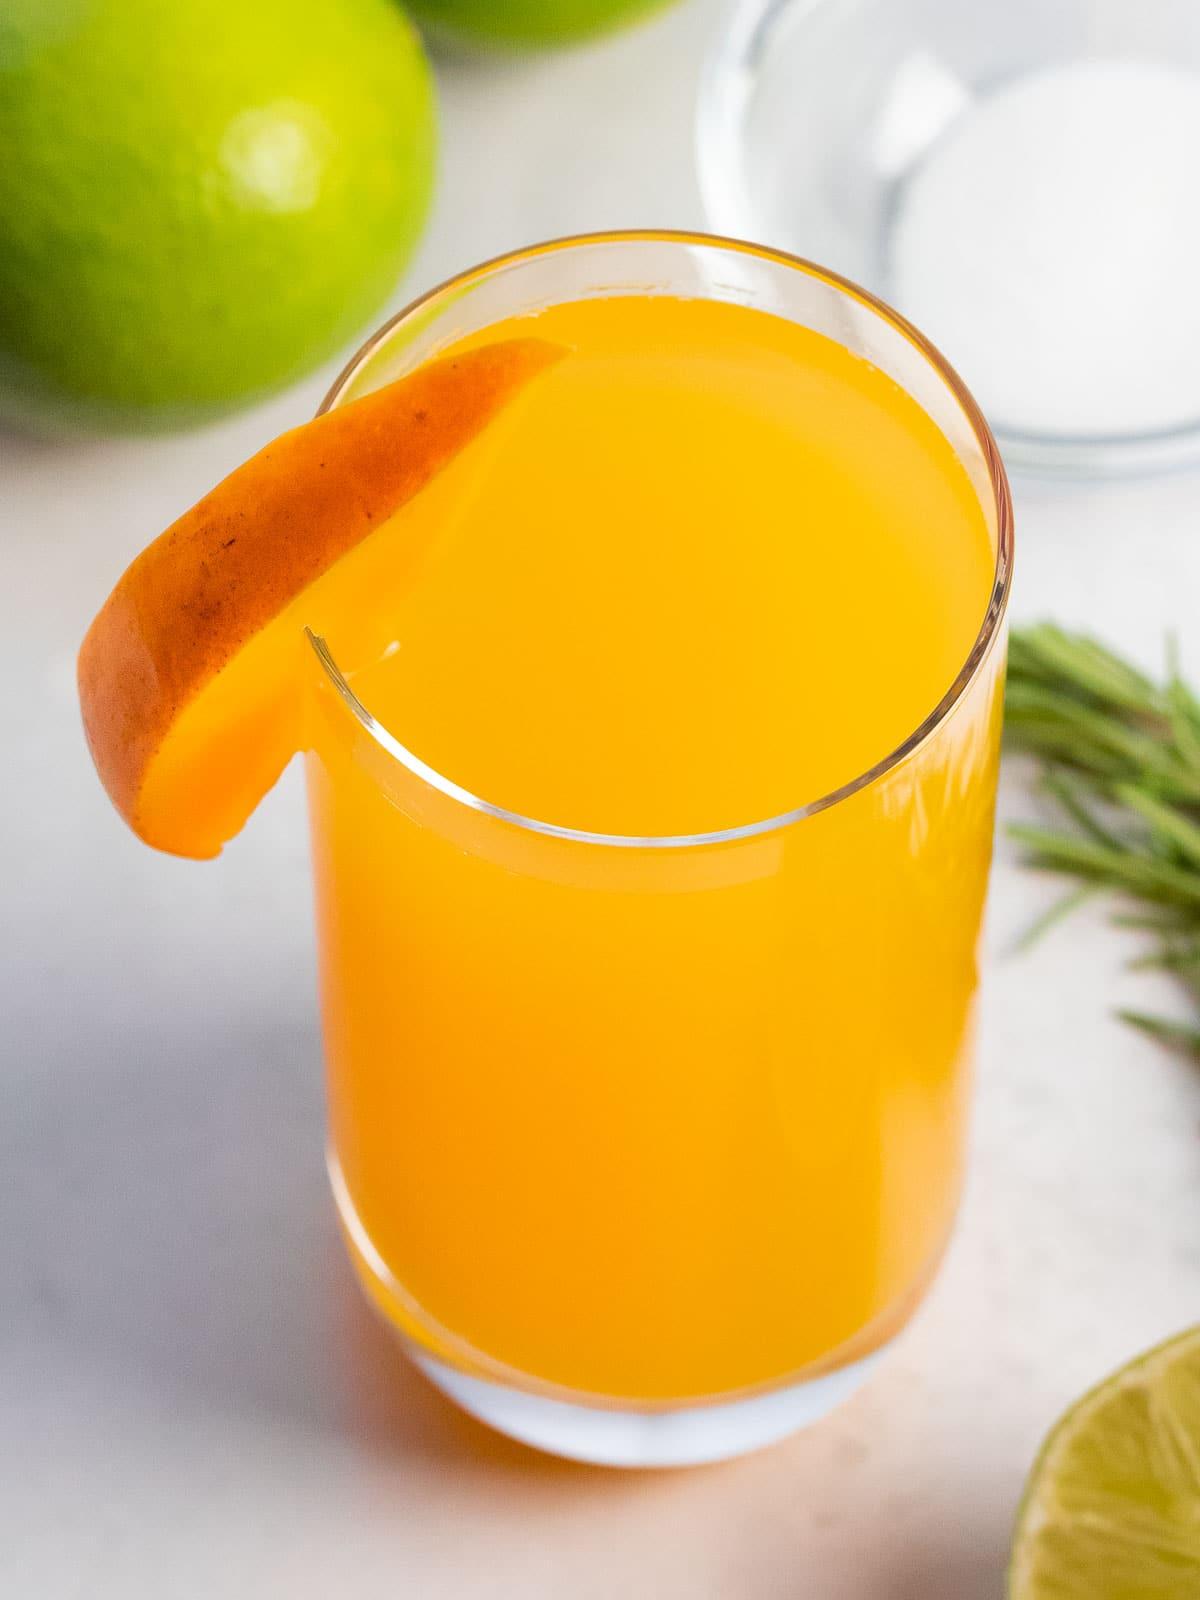 glass of mango agua fresca with a slice of mango